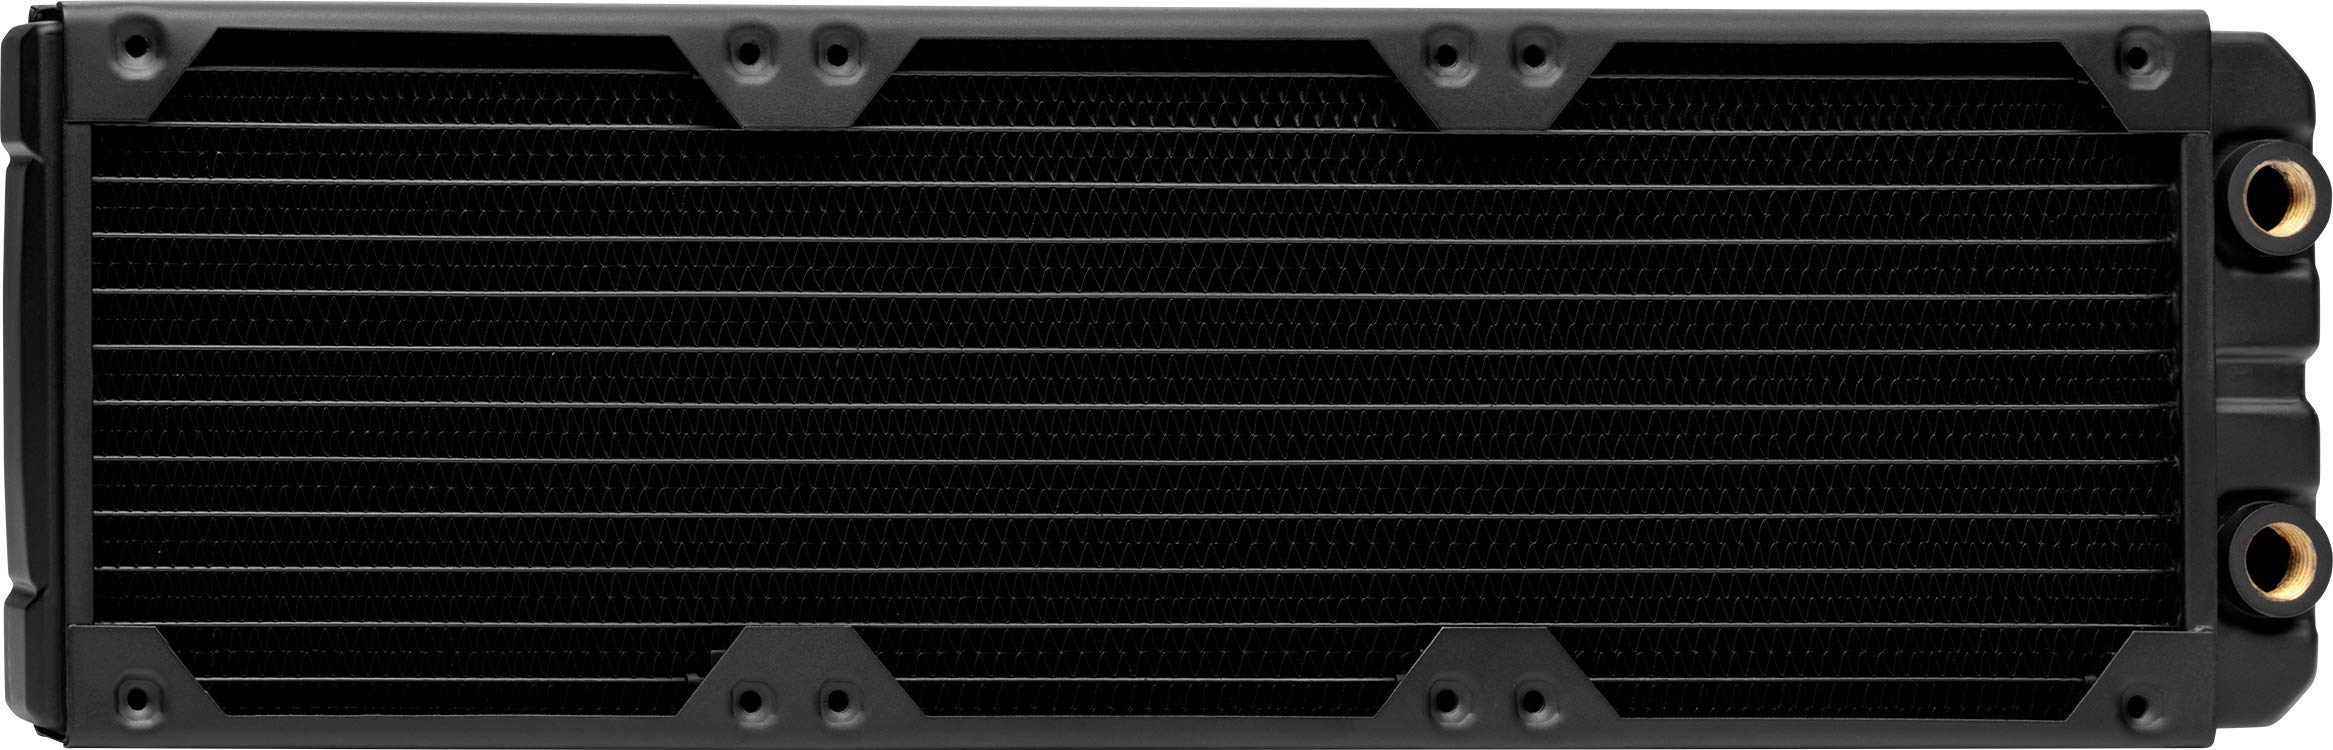 Corsair Hydro X Series XR5 360mm Water Cooling Radiator by Corsair